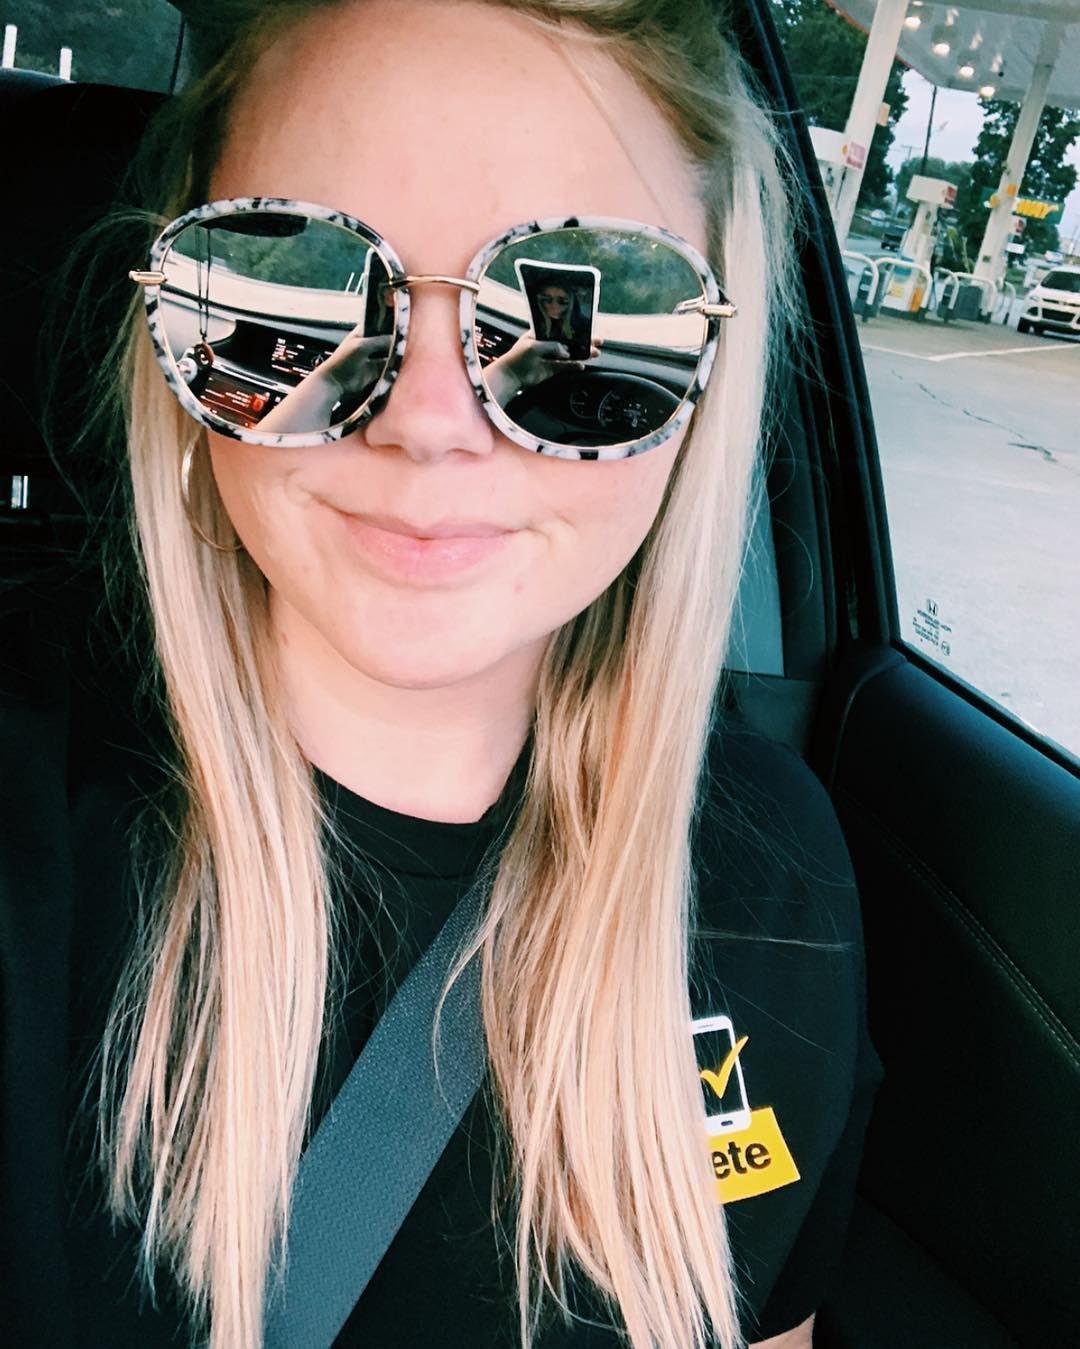 6d6bae22ad64 Random Selfie just because I love these sunglasses! 💕 #selfie #selfiesunday